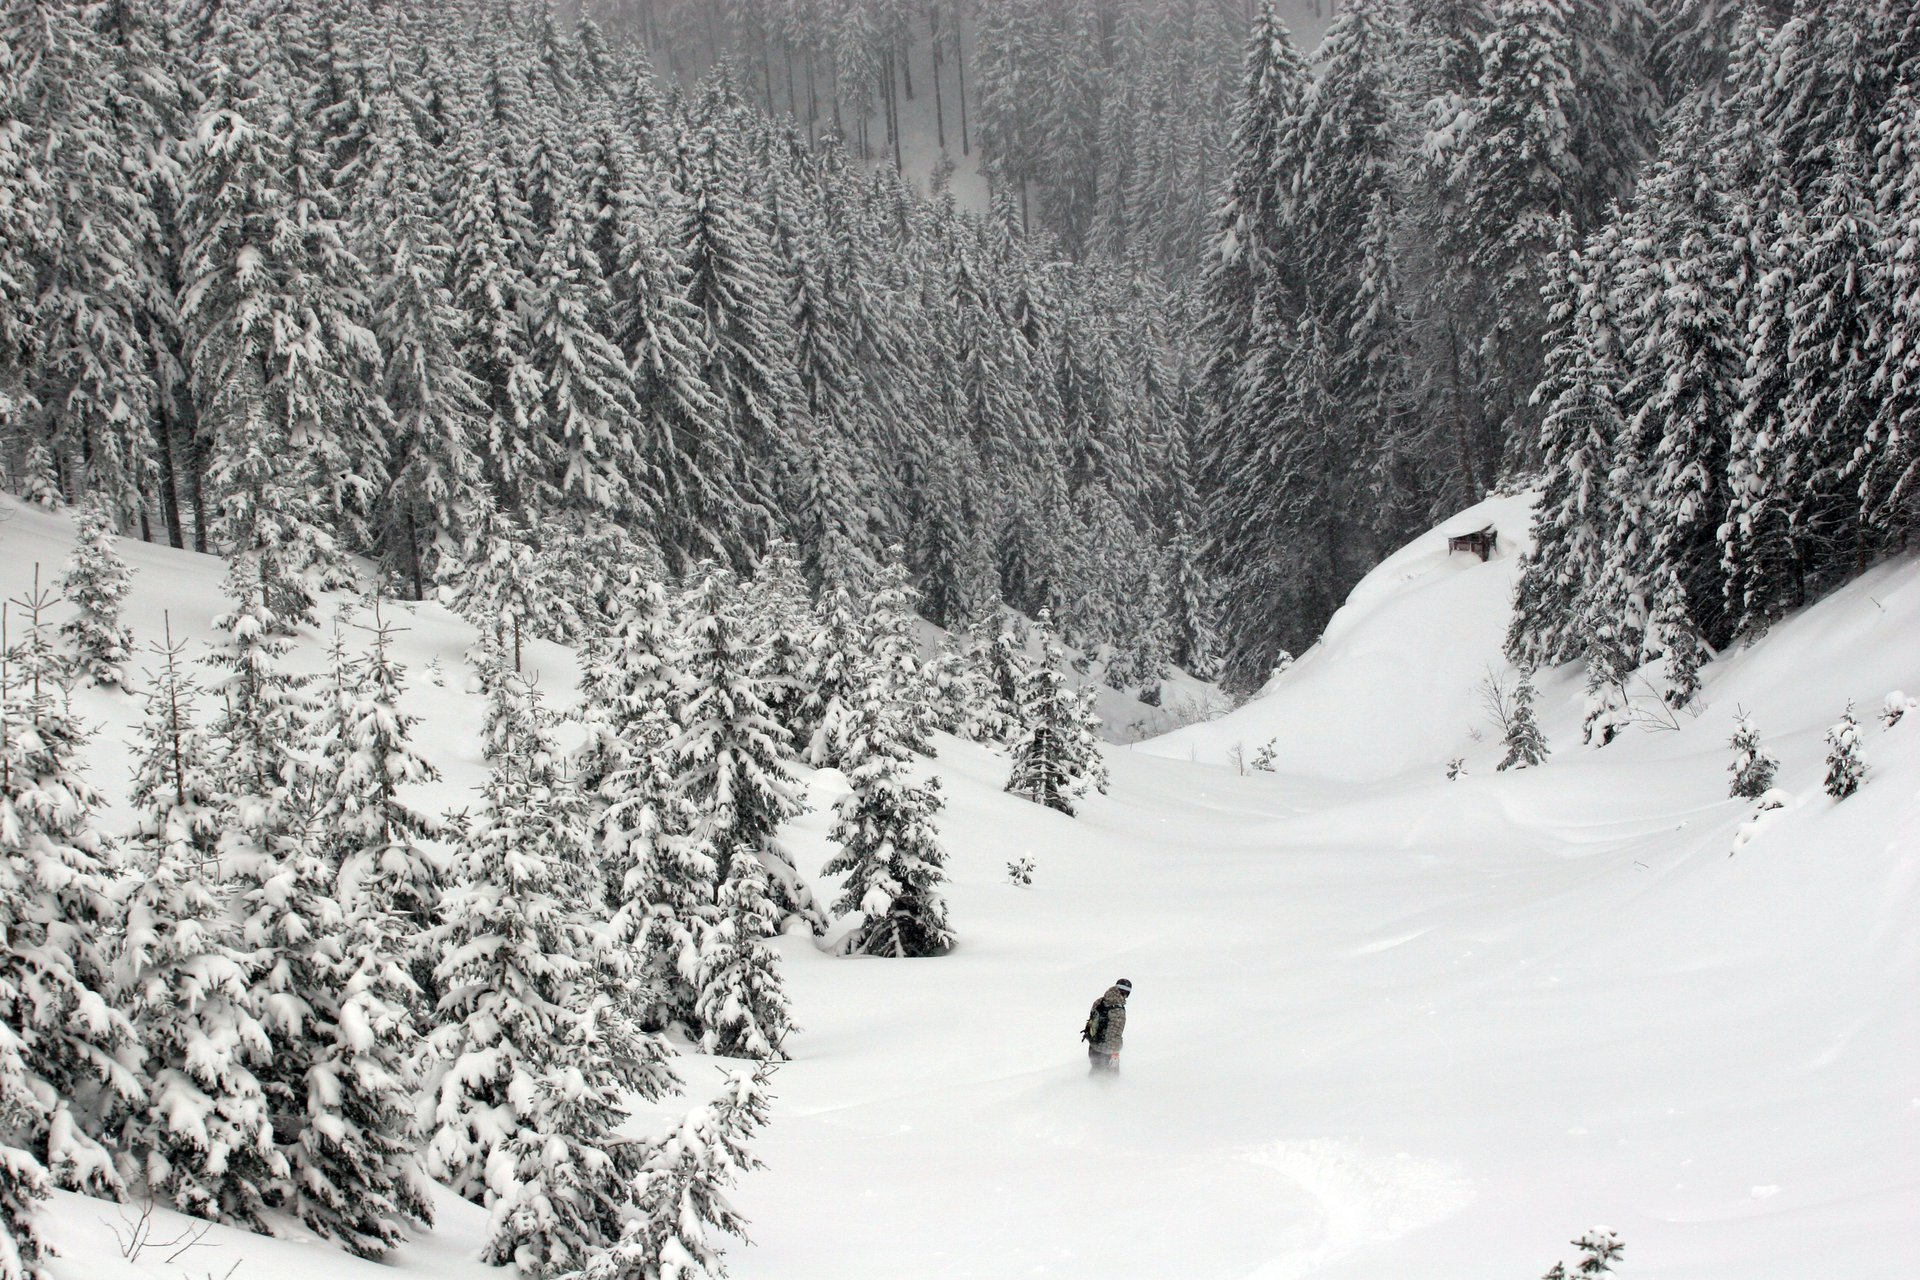 Snowboard turn #1